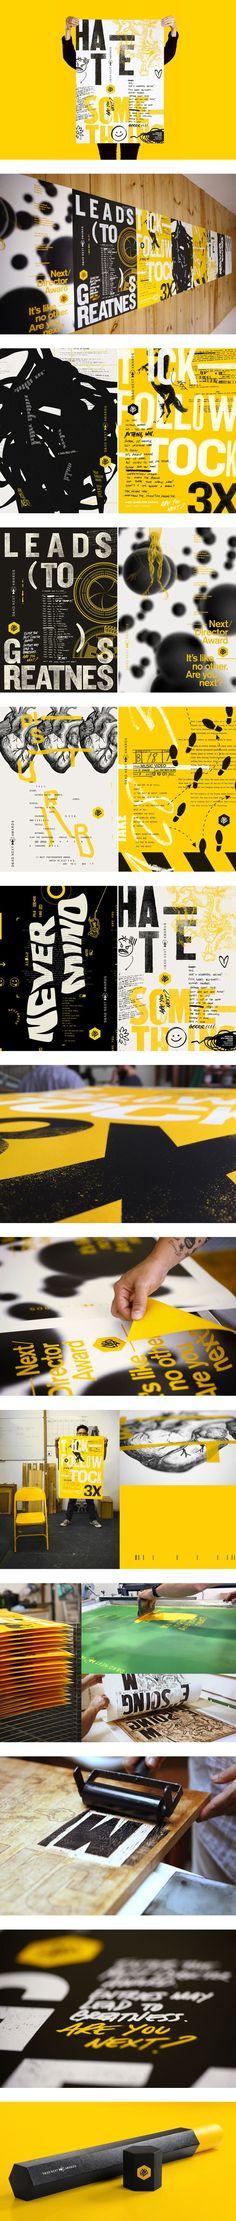 D&AD NEXT AWARDS - Rodrigo Castellari This reminds me of that mid nineties Carson / ray gun stuff Mais Type Posters, Graphic Design Posters, Graphic Design Typography, Graphic Design Illustration, Graphic Design Inspiration, Branding Design, Graphisches Design, Book Design, Layout Design